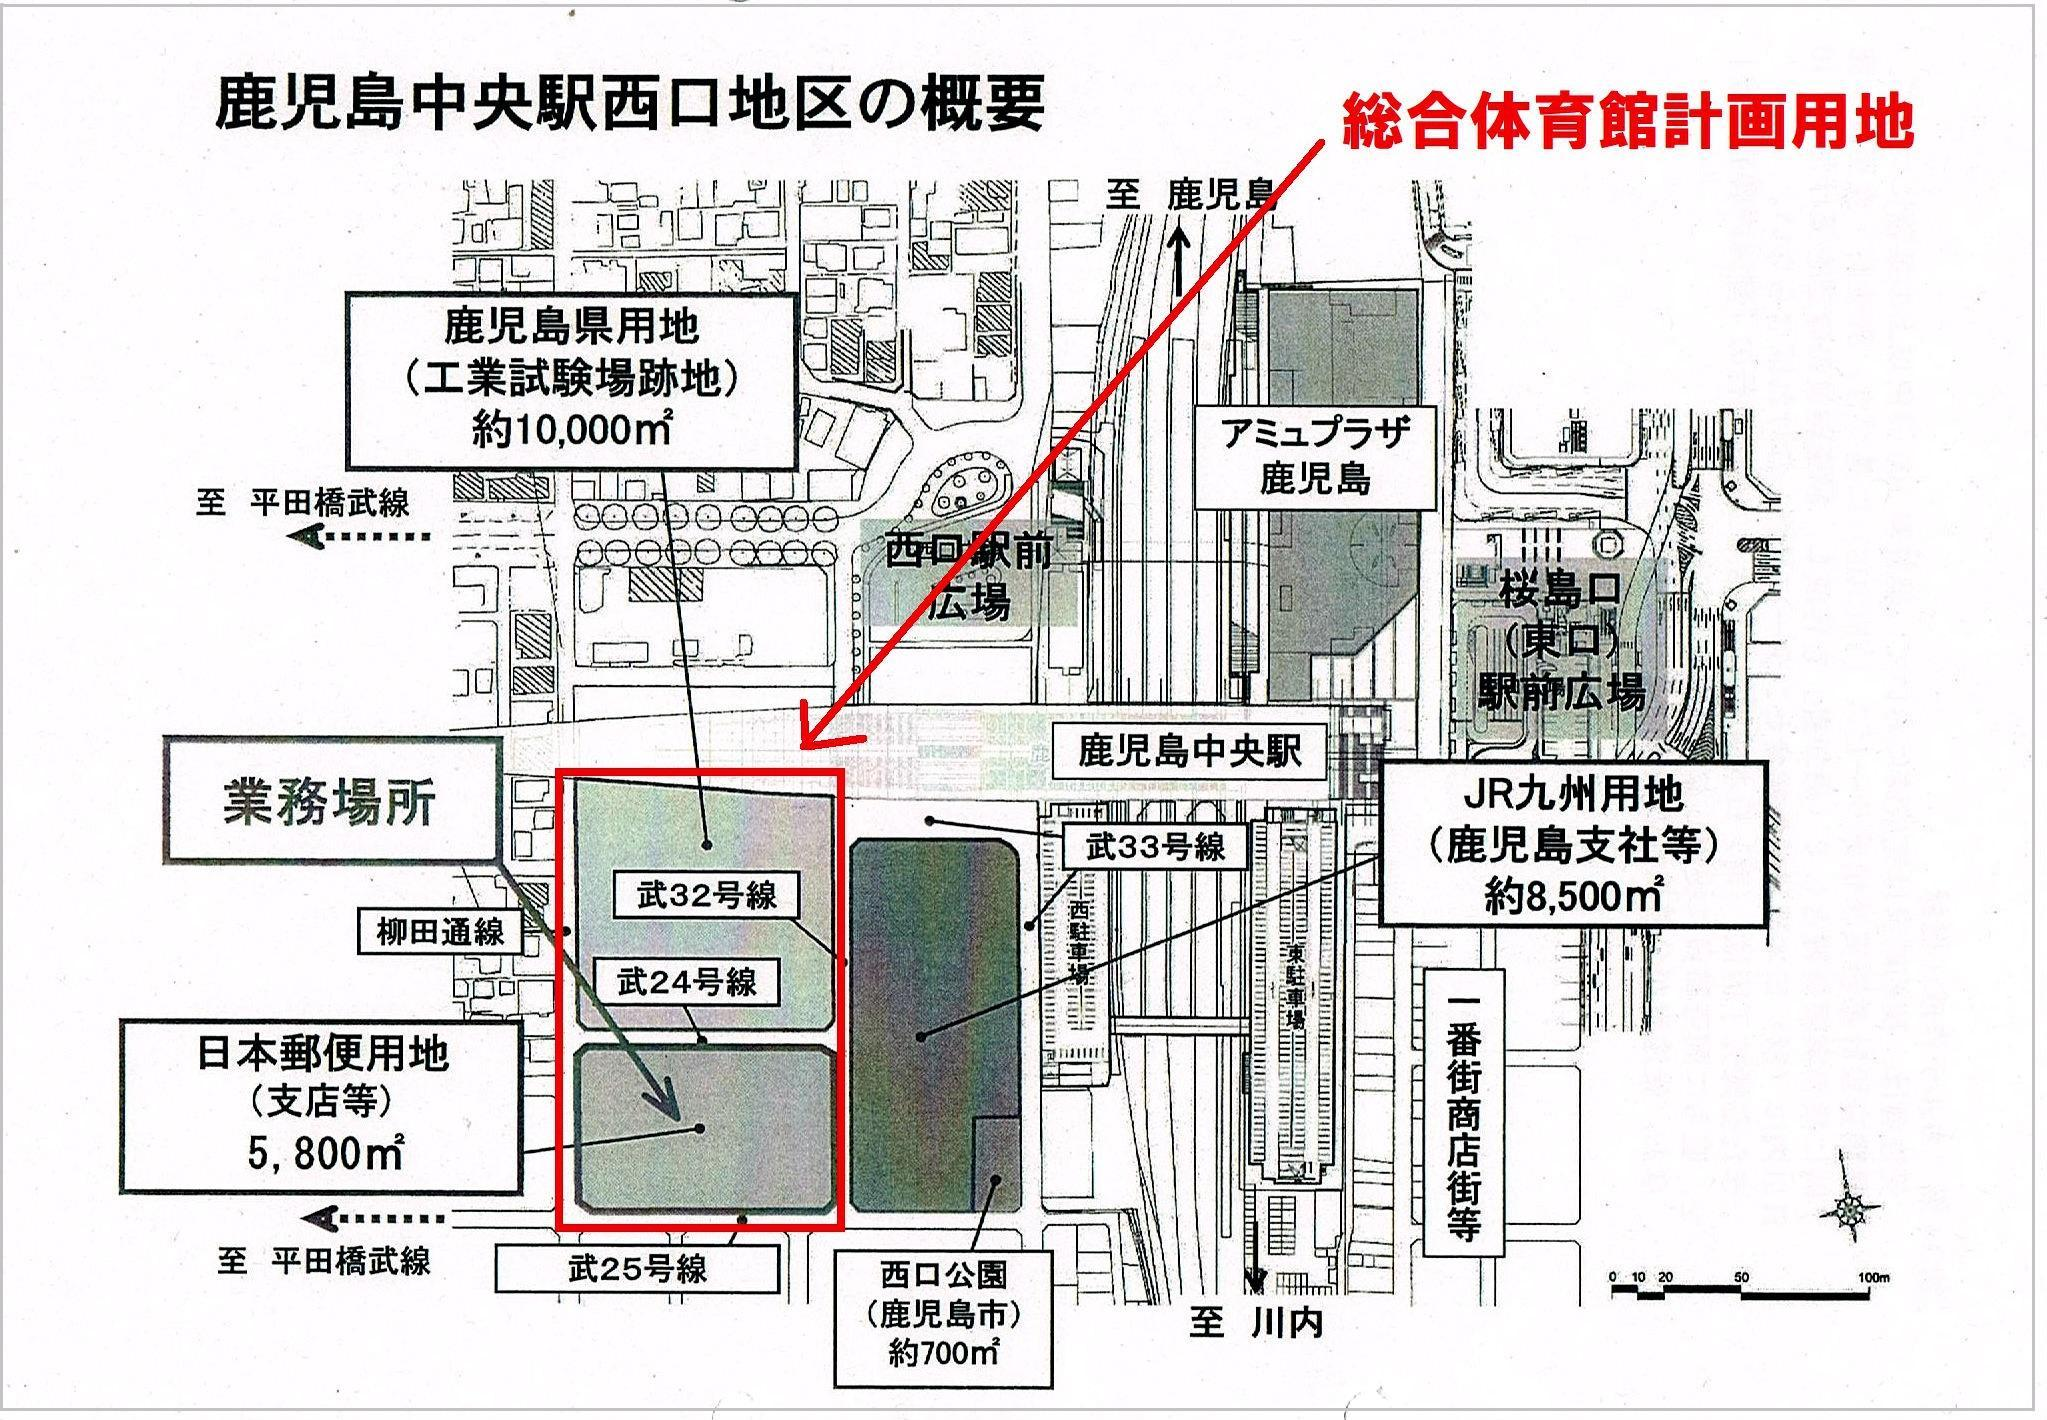 http://hunter-investigate.jp/news/9a7ae710c61e7019d9fd5928fba90b347ff412b1.jpg